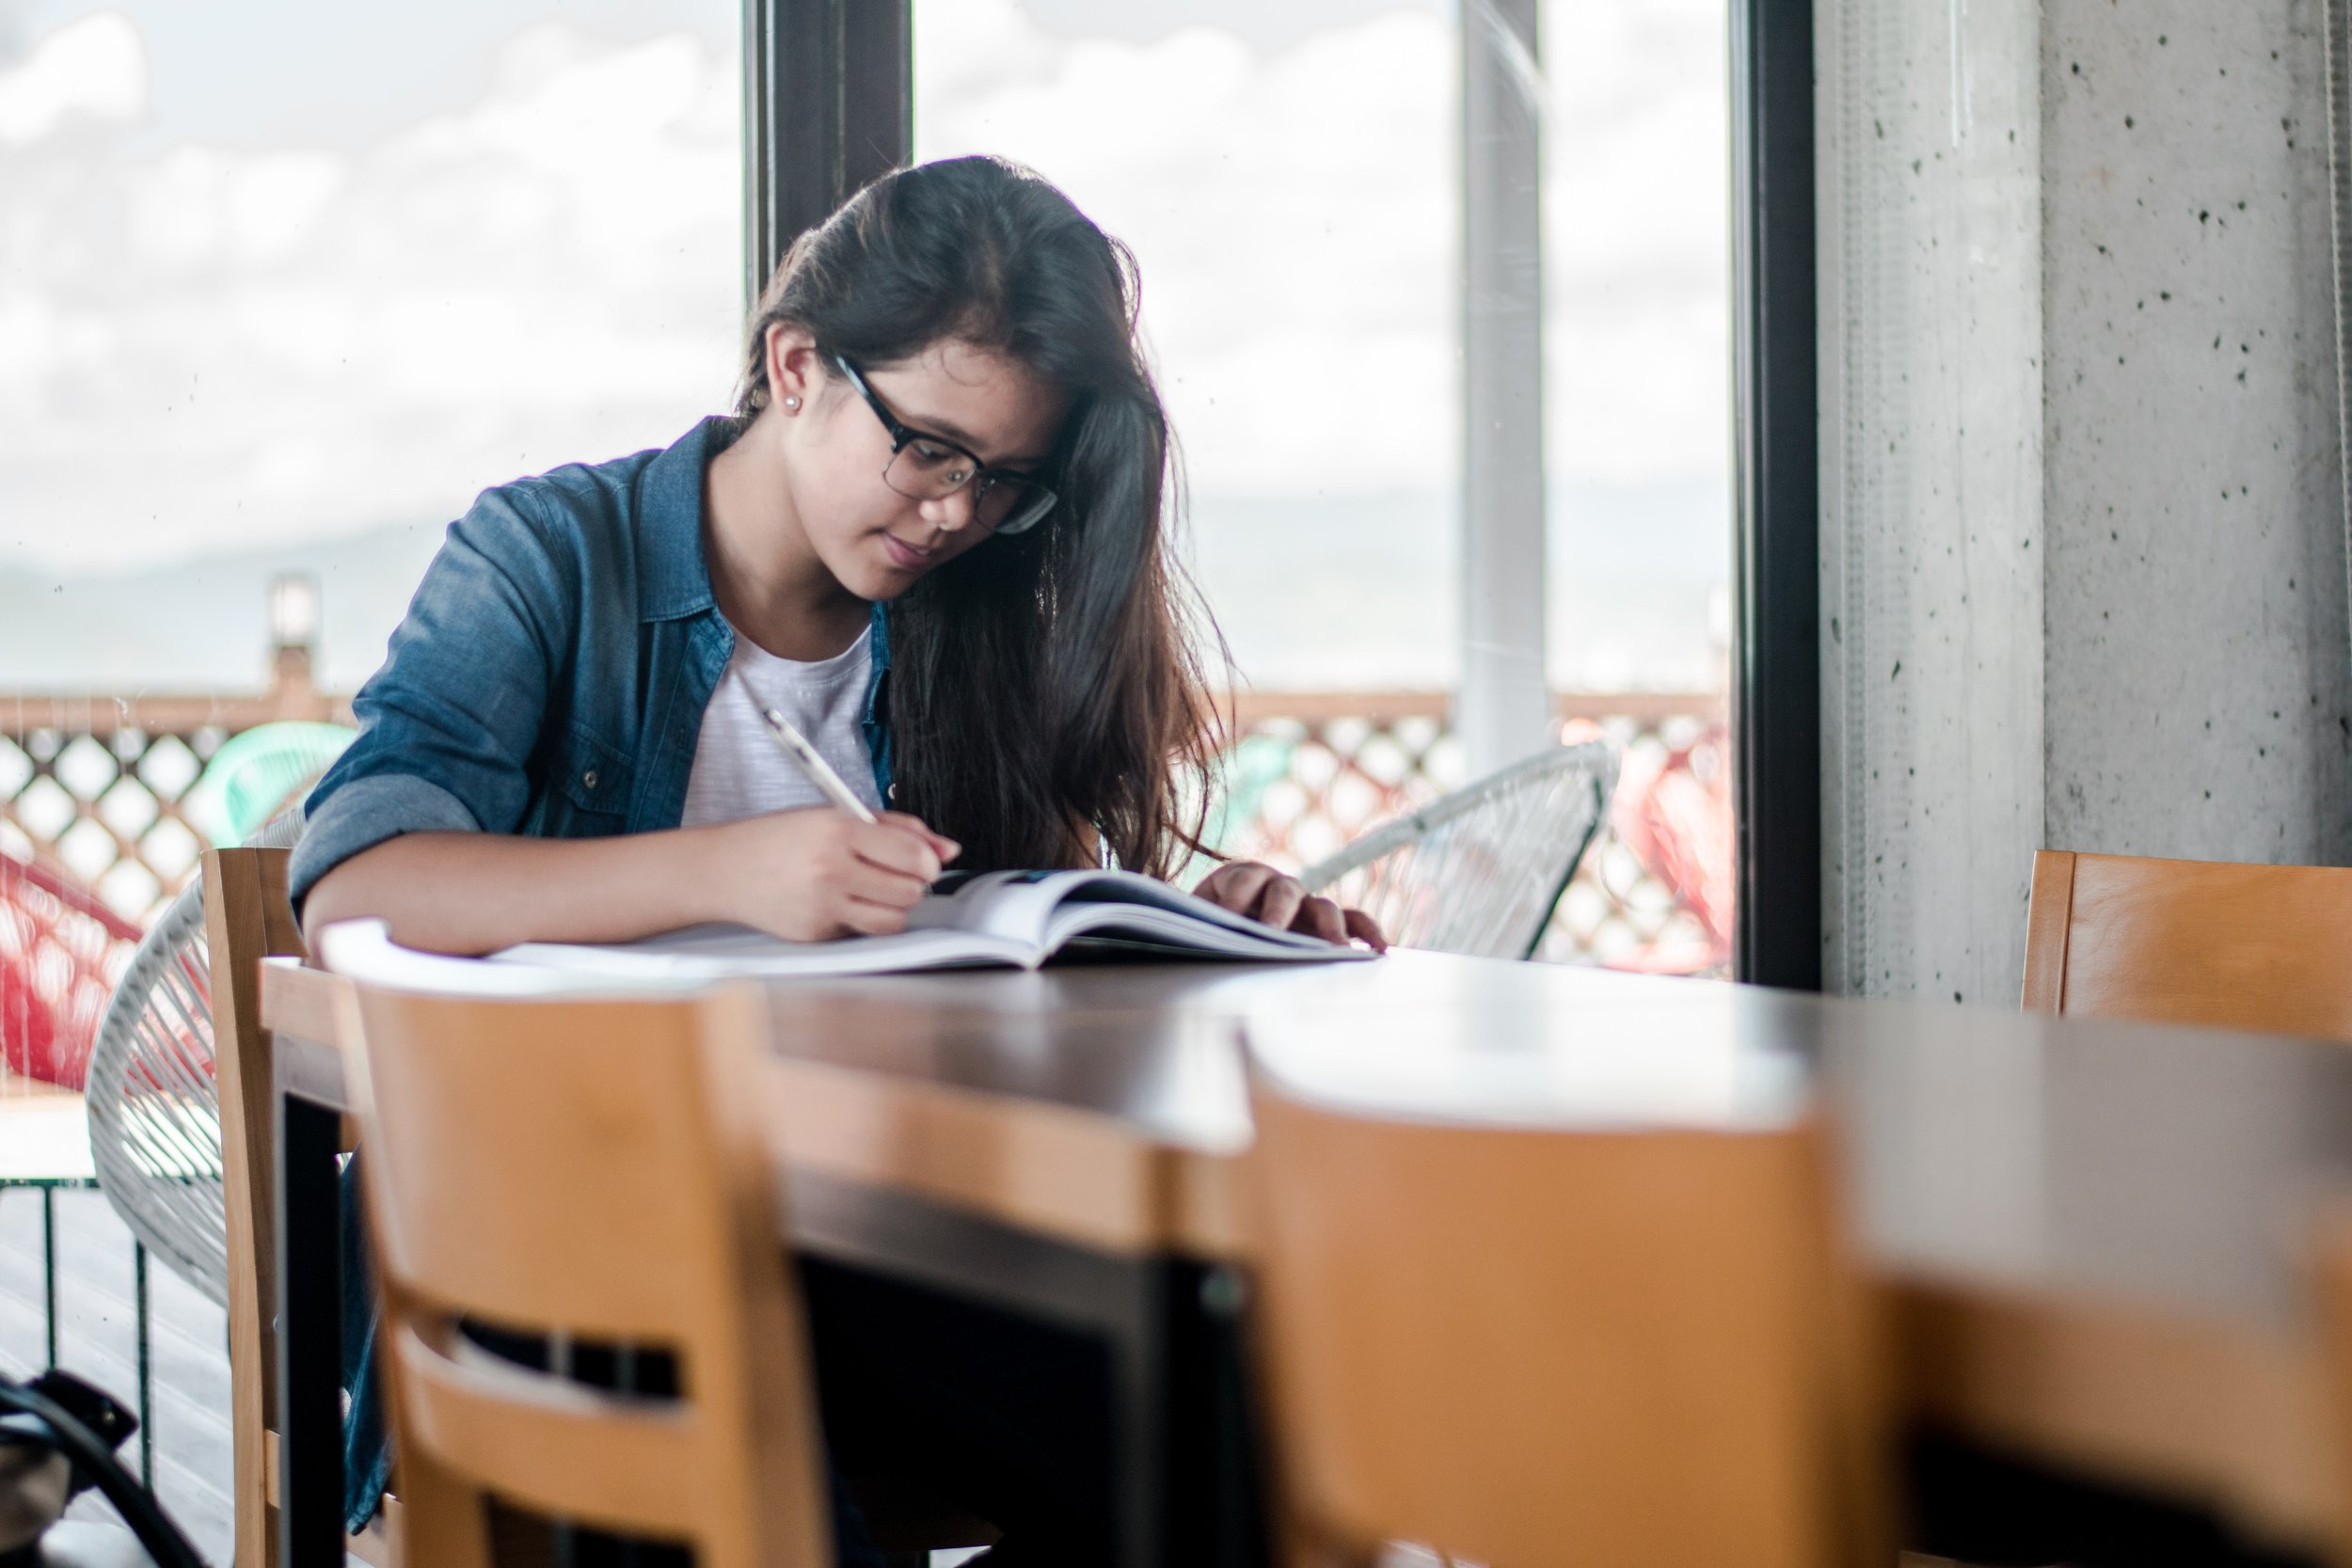 Importance of feedback in education